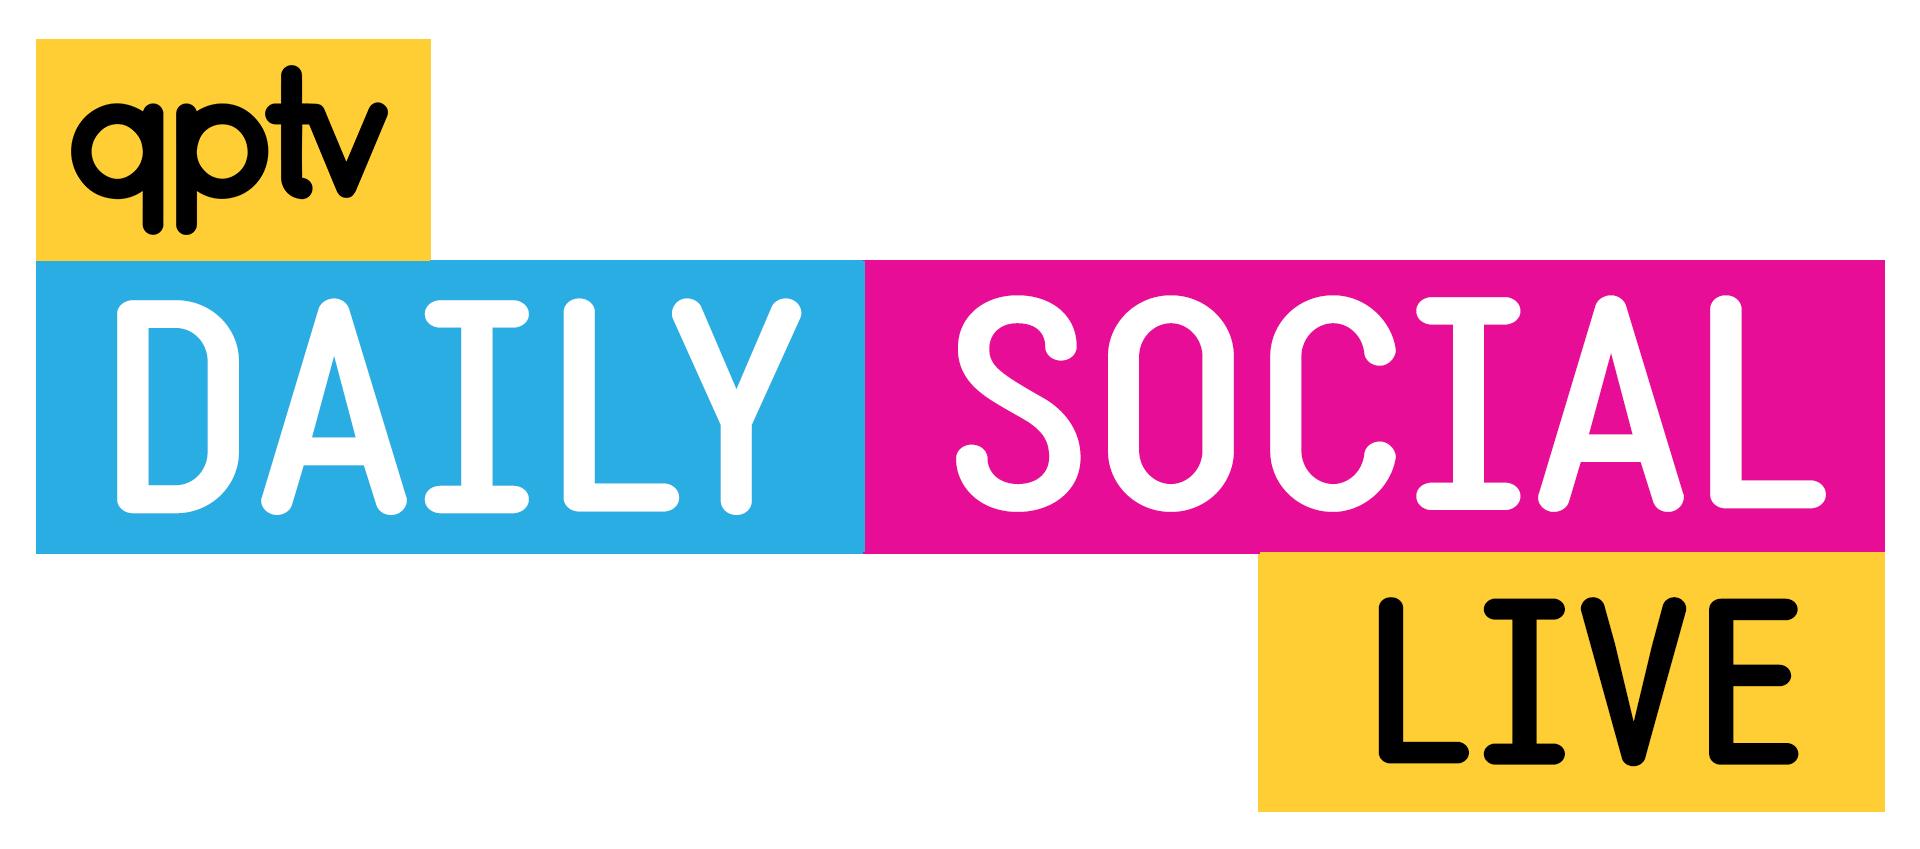 QPTV Daily Social Live